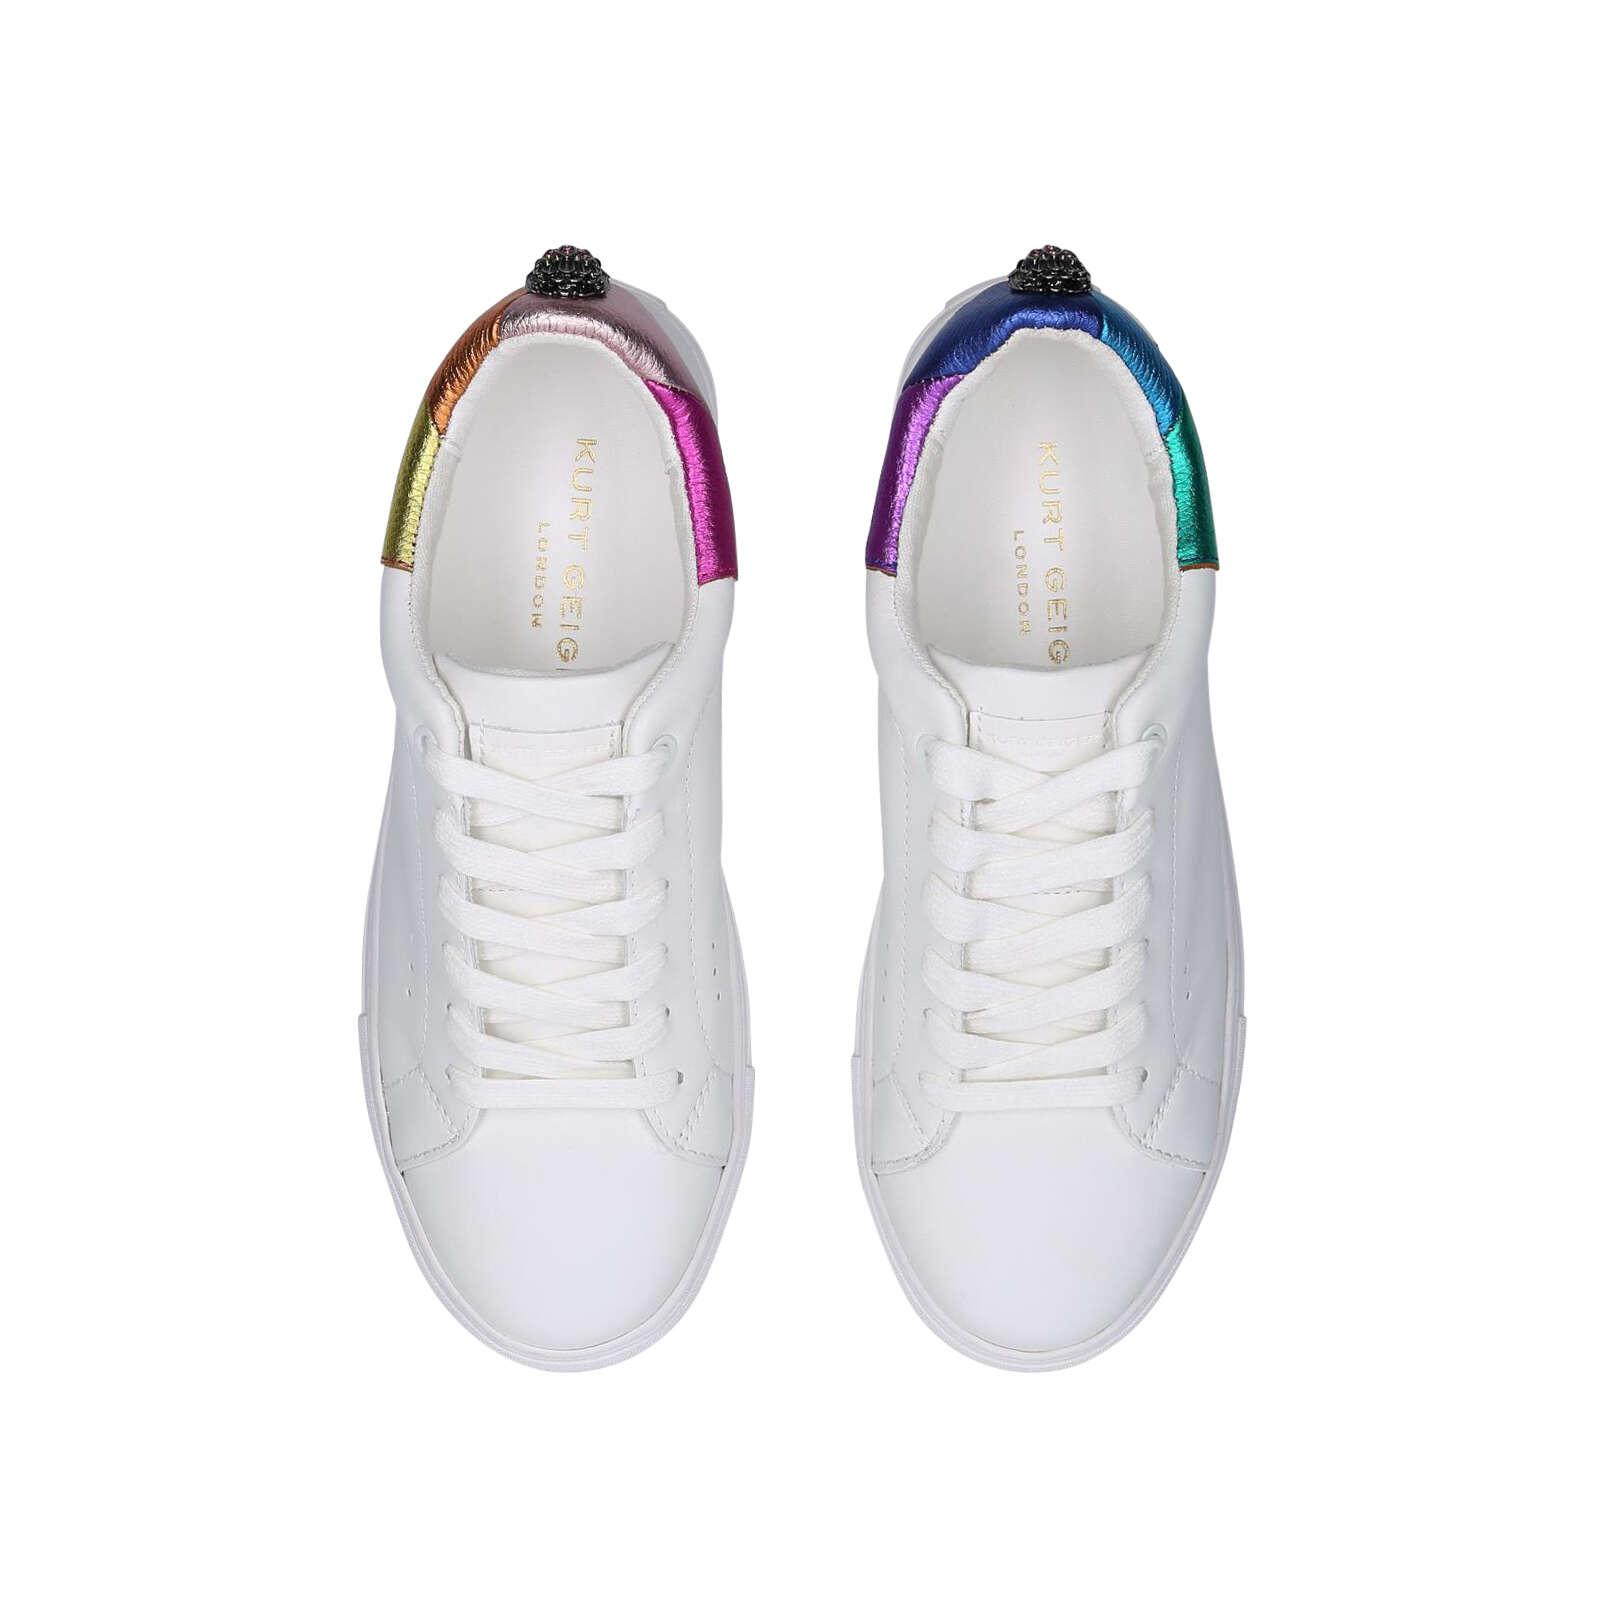 LANEY EAGLE - KURT GEIGER LONDON Sneakers